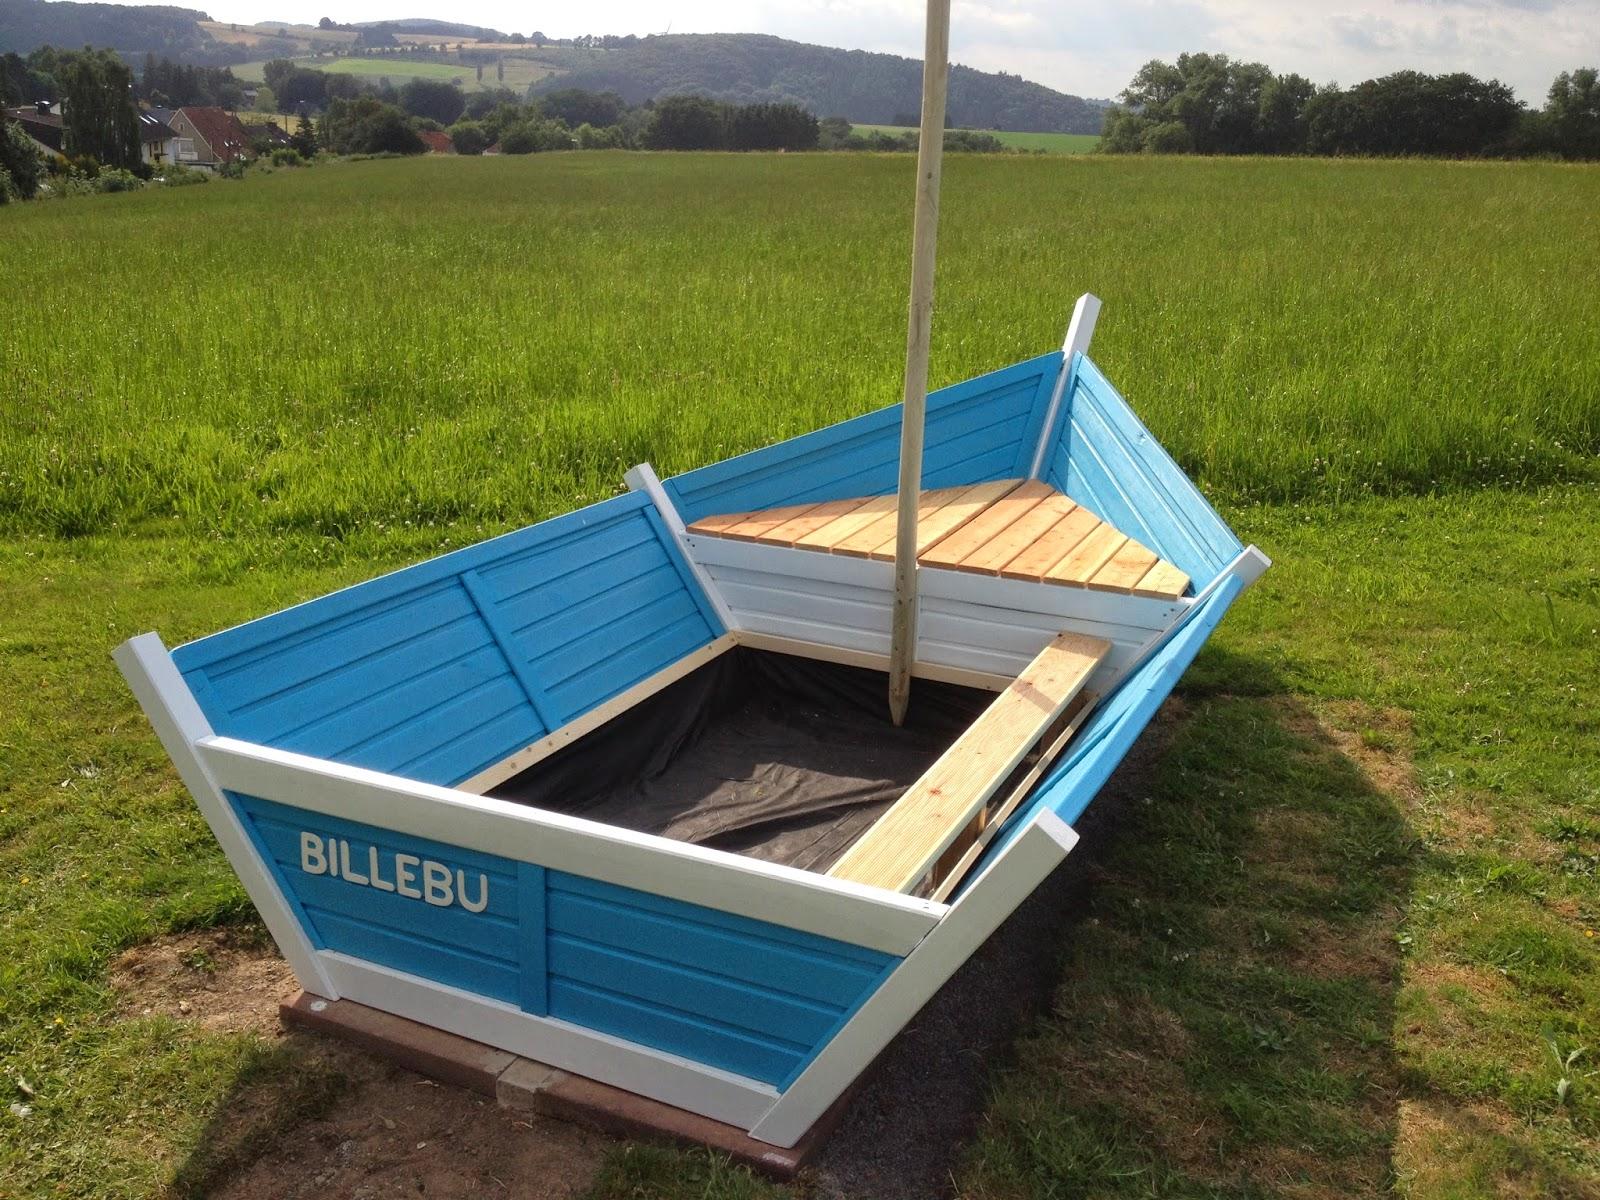 carstens leisure time blog bau eines diy segelboot sandkastens. Black Bedroom Furniture Sets. Home Design Ideas